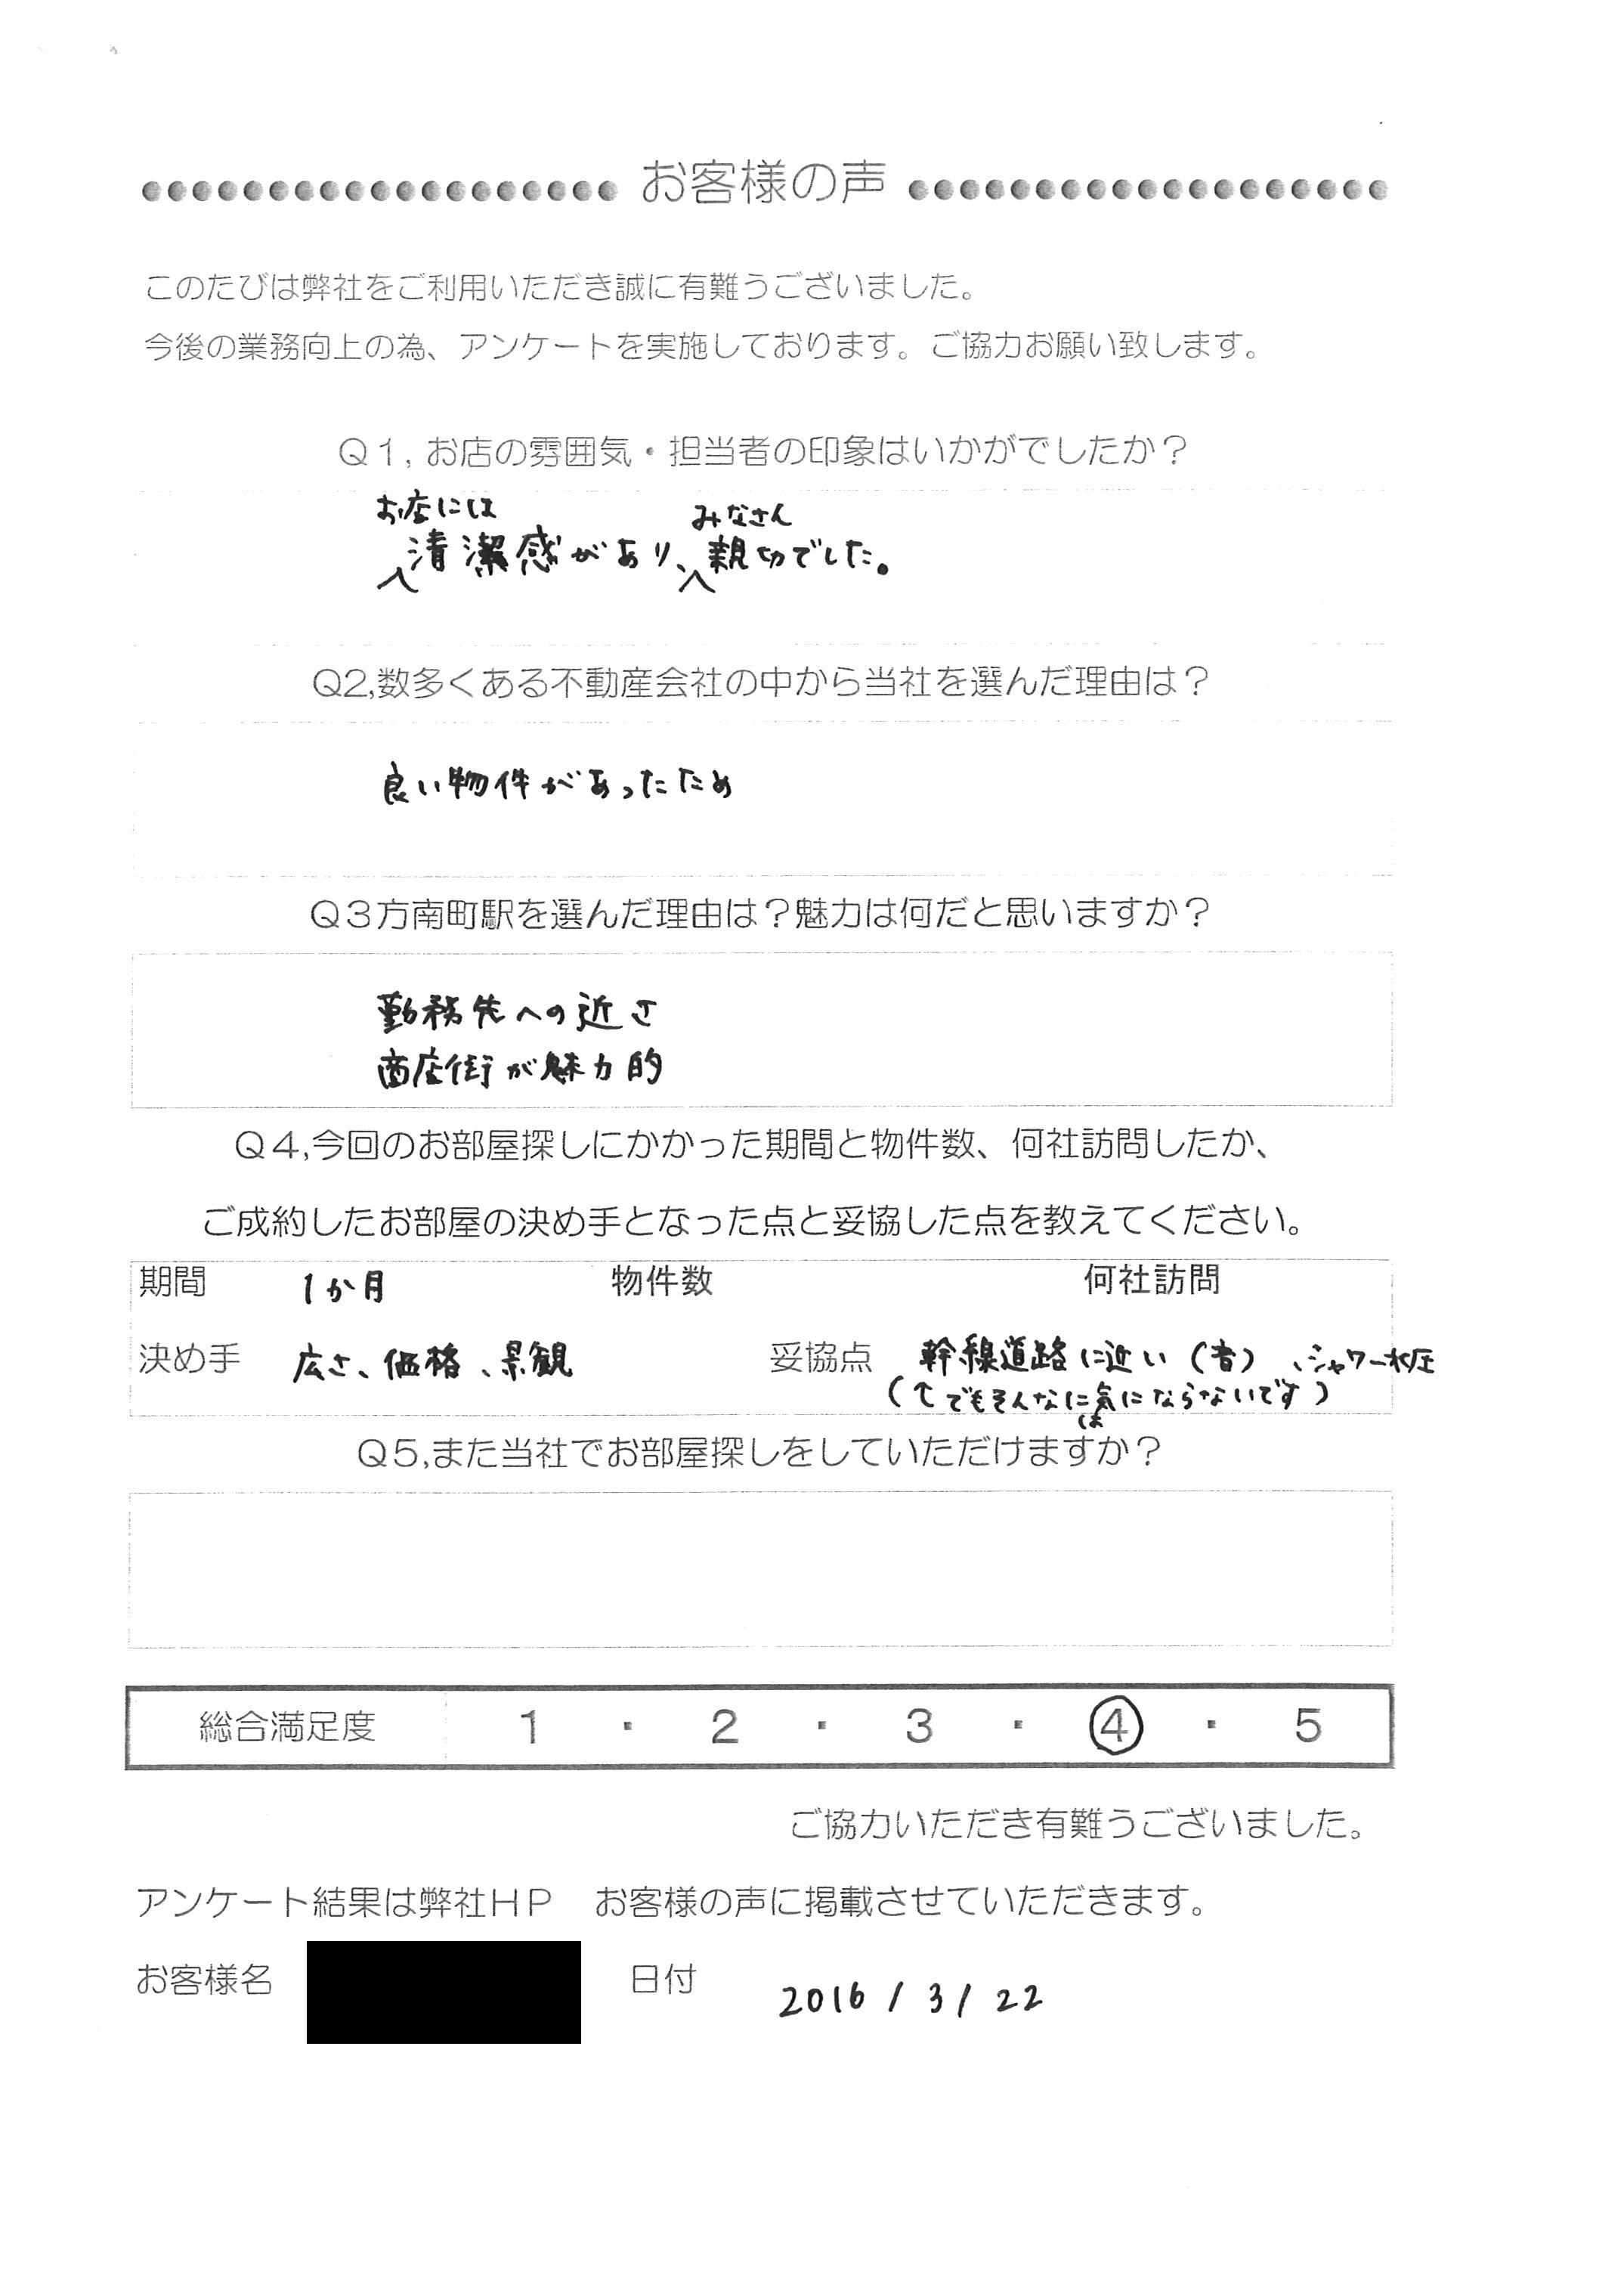 I・H 様 (33歳)男性(会社員)アンケート回答